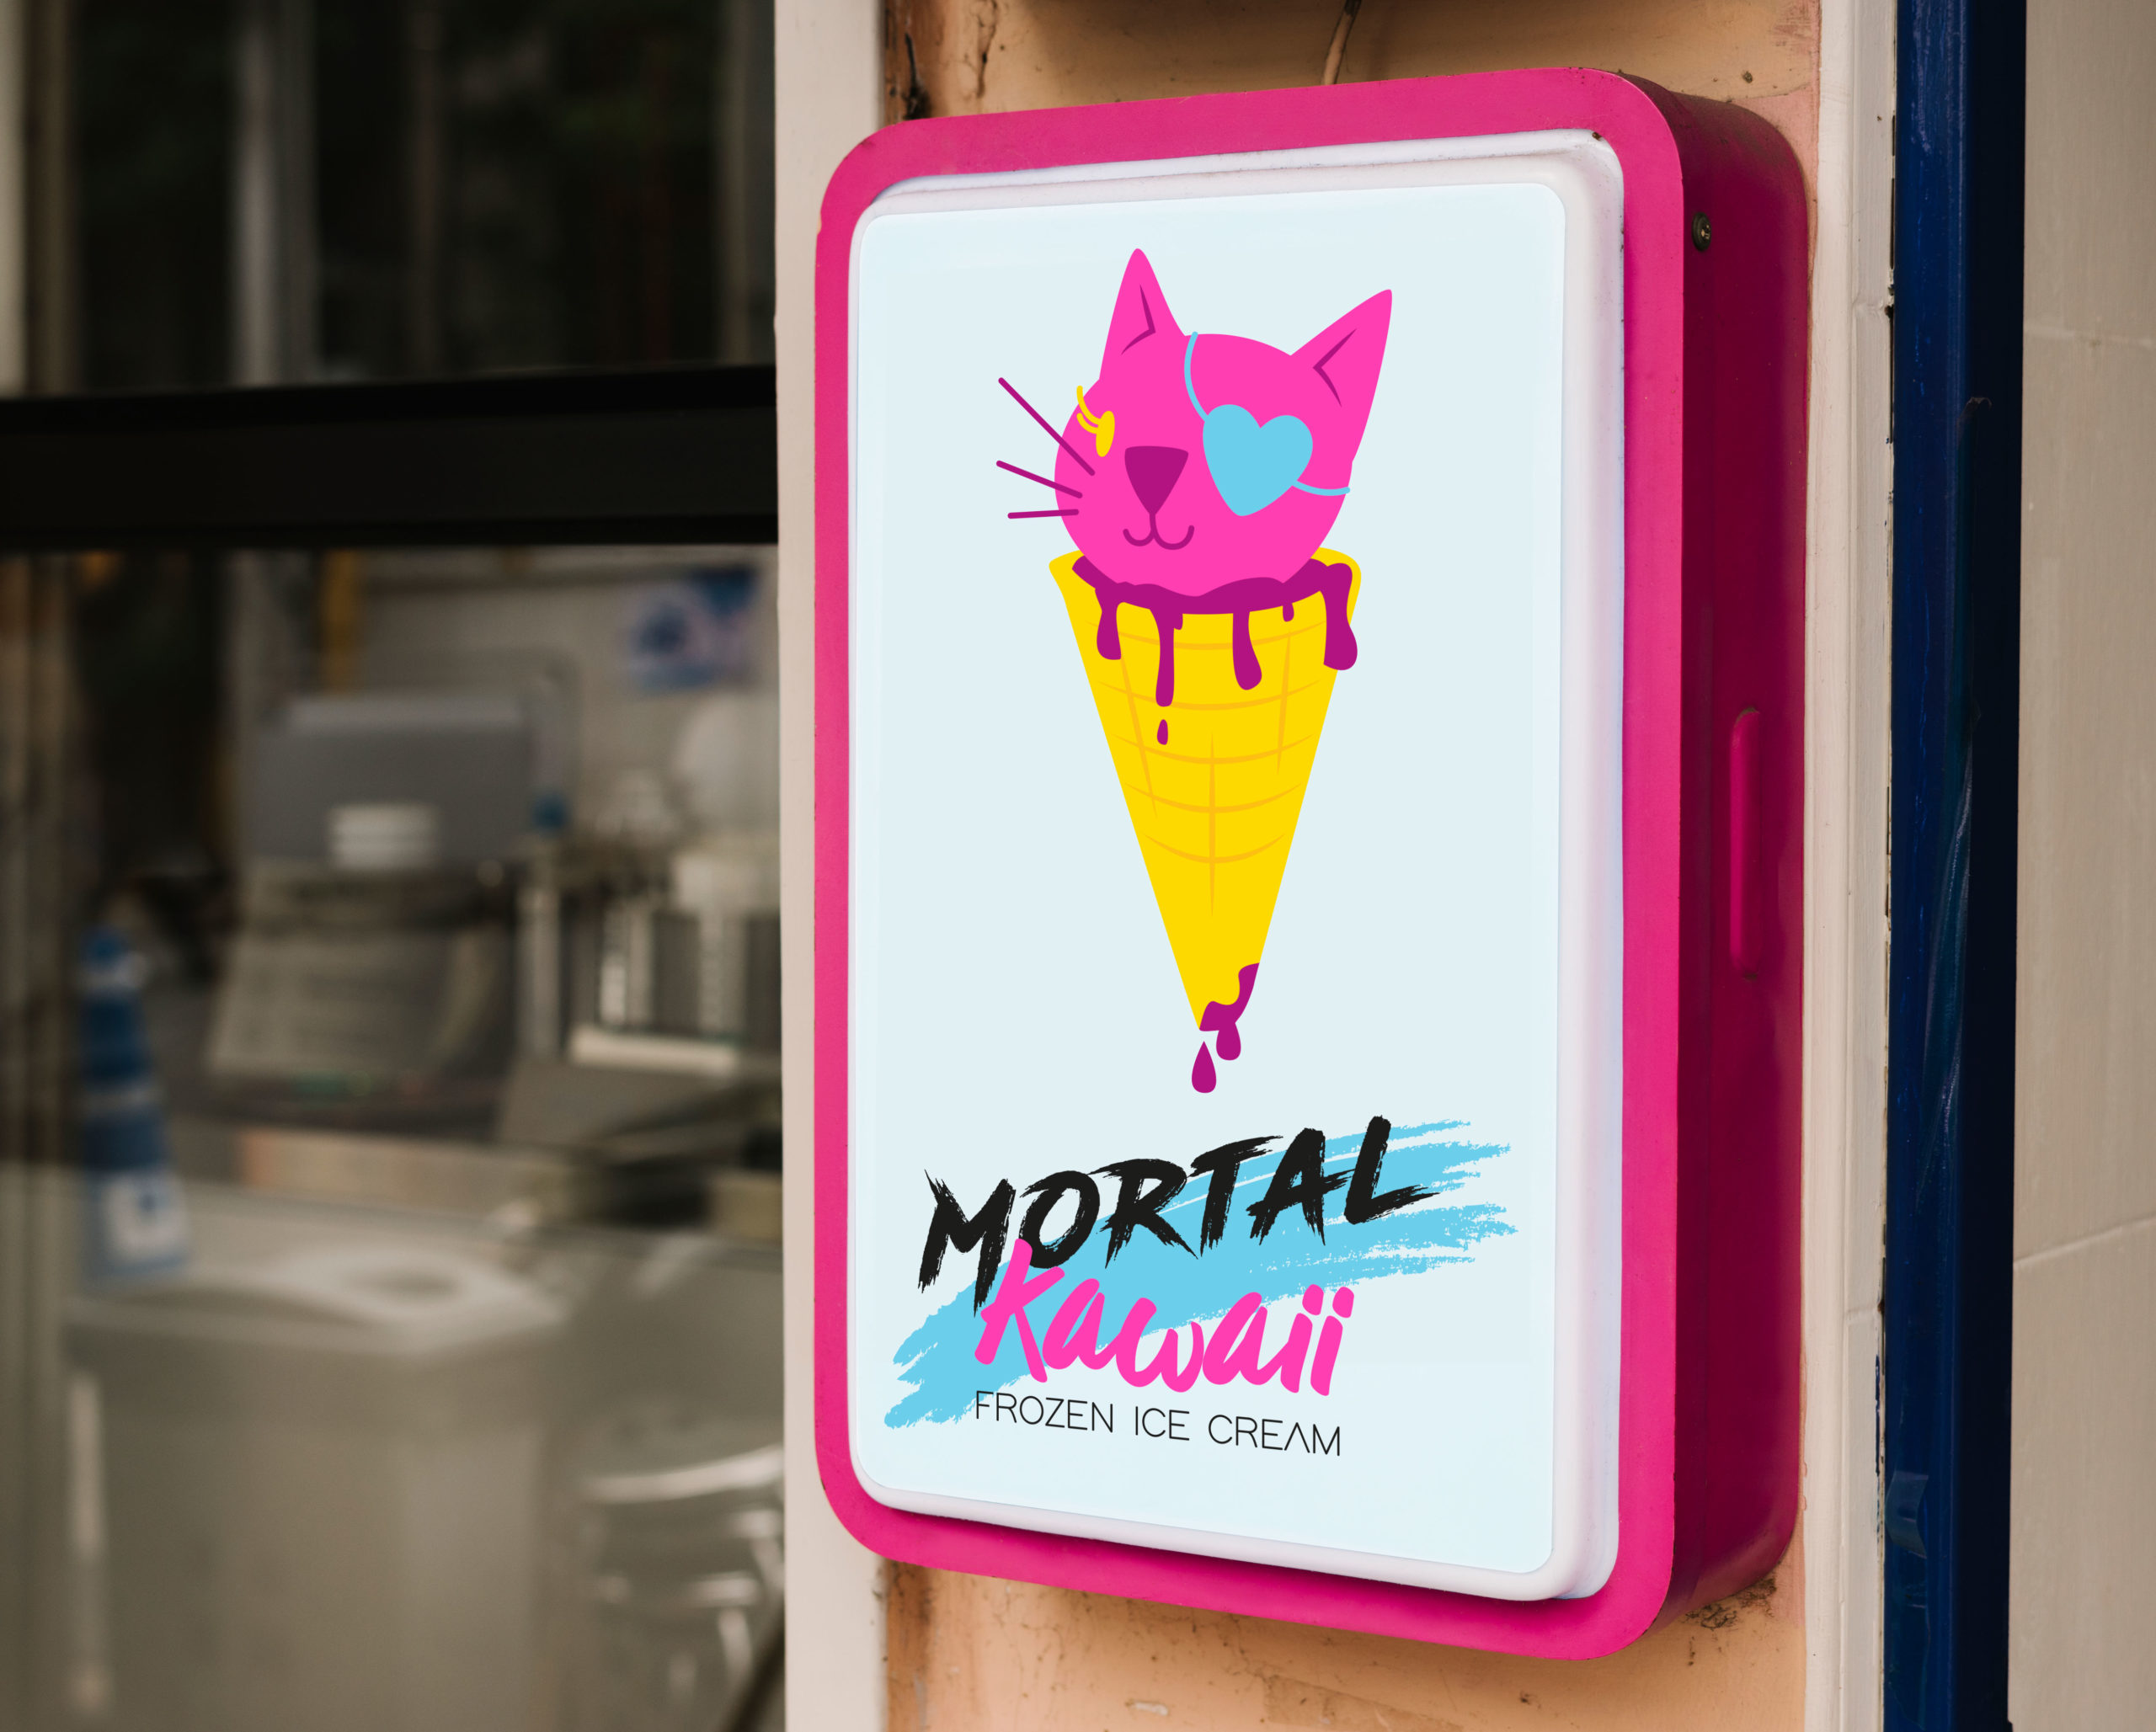 Mortal Kawaii Frozen IceCream